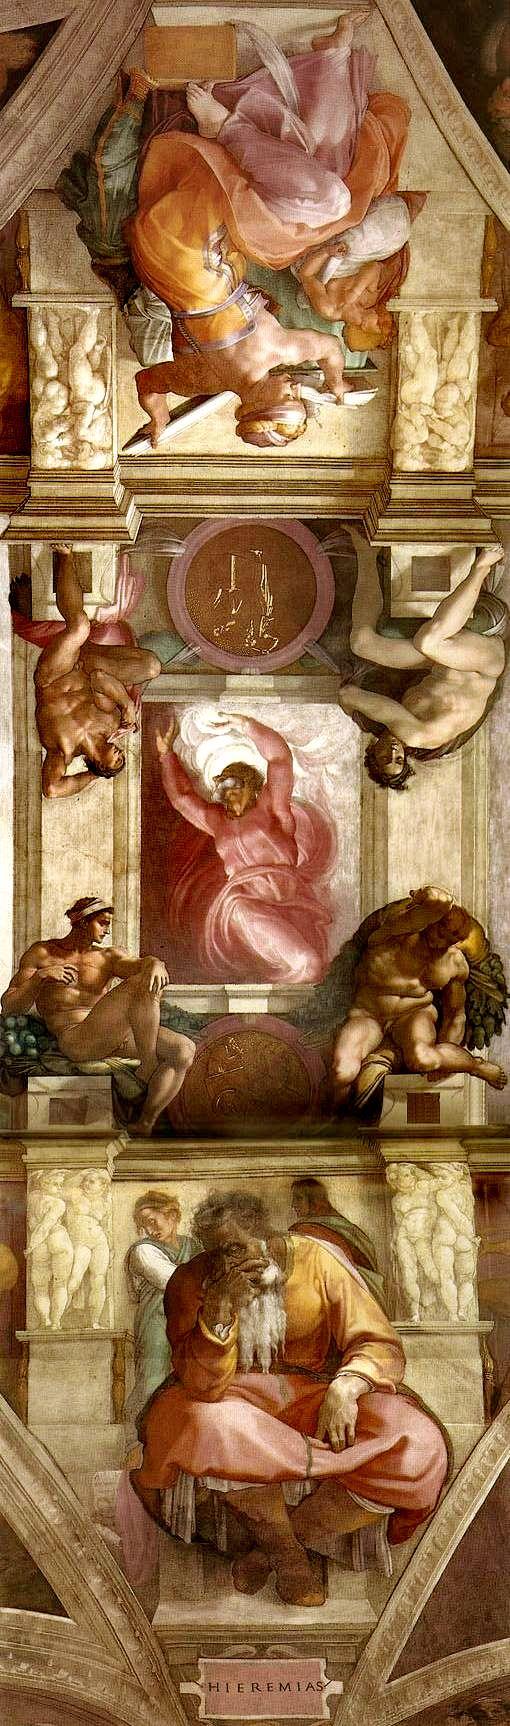 MICHELANGELO BUONARROTI - (1475 - 1564) - Sistine Chapel